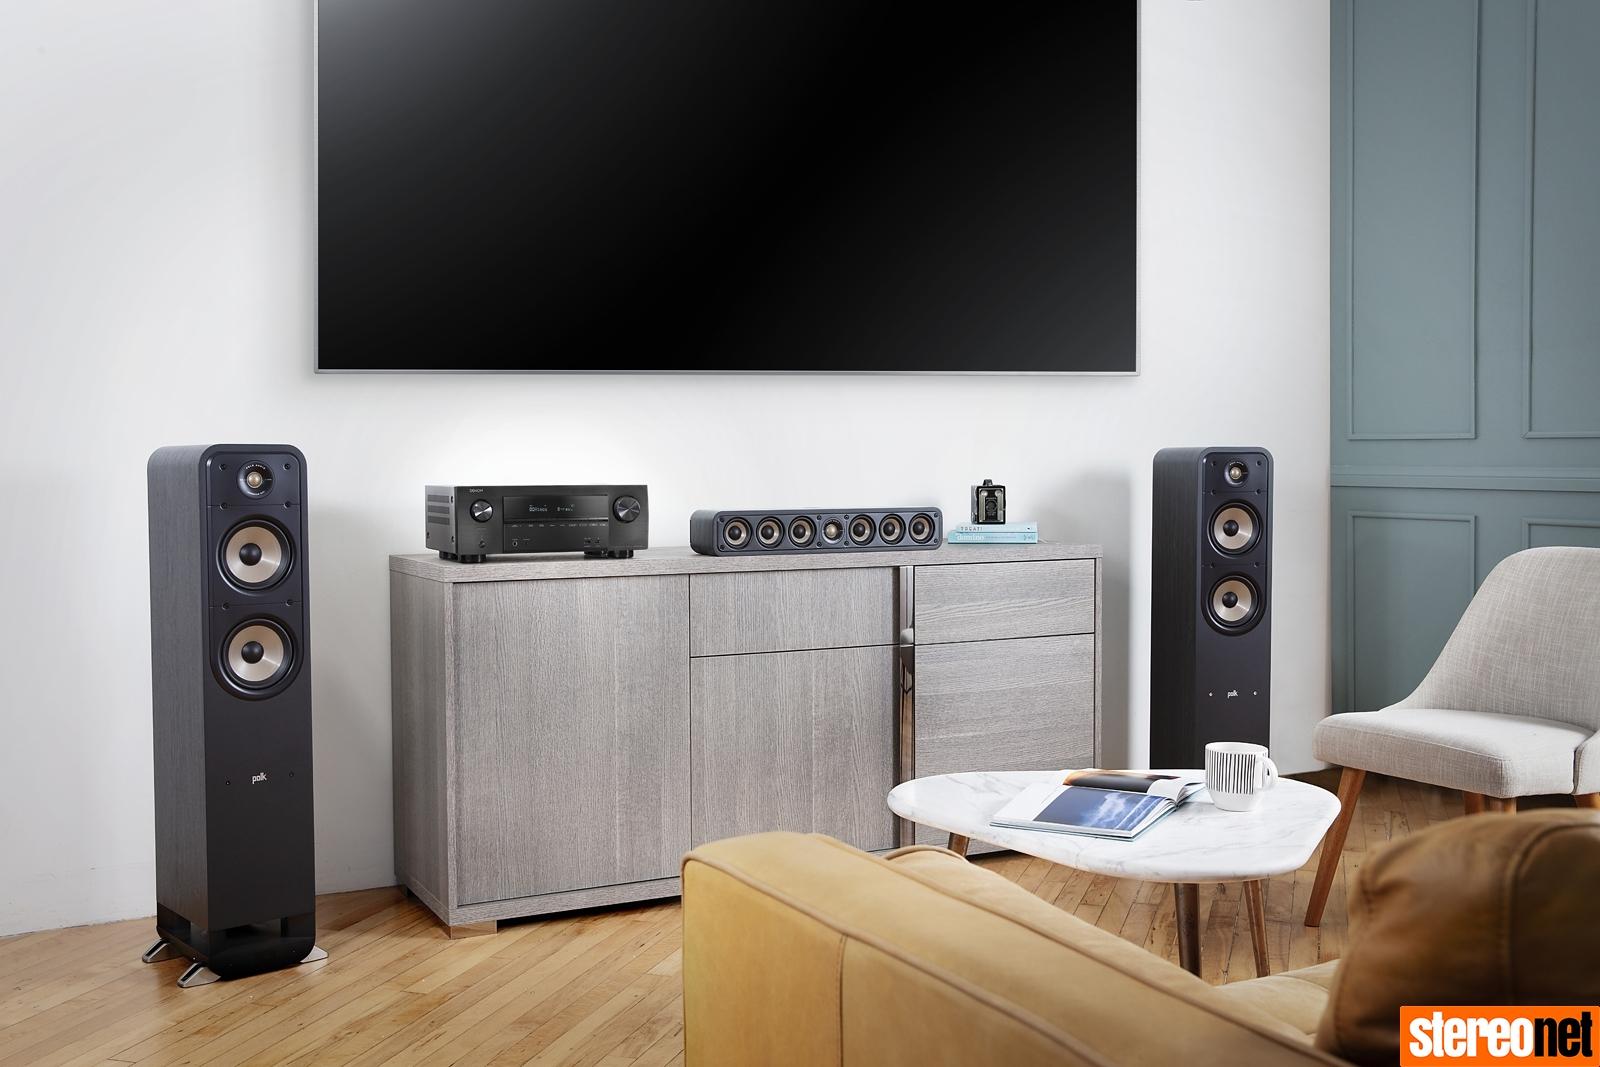 Denon and Marantz Launch Five New AV Receivers | - StereoNET